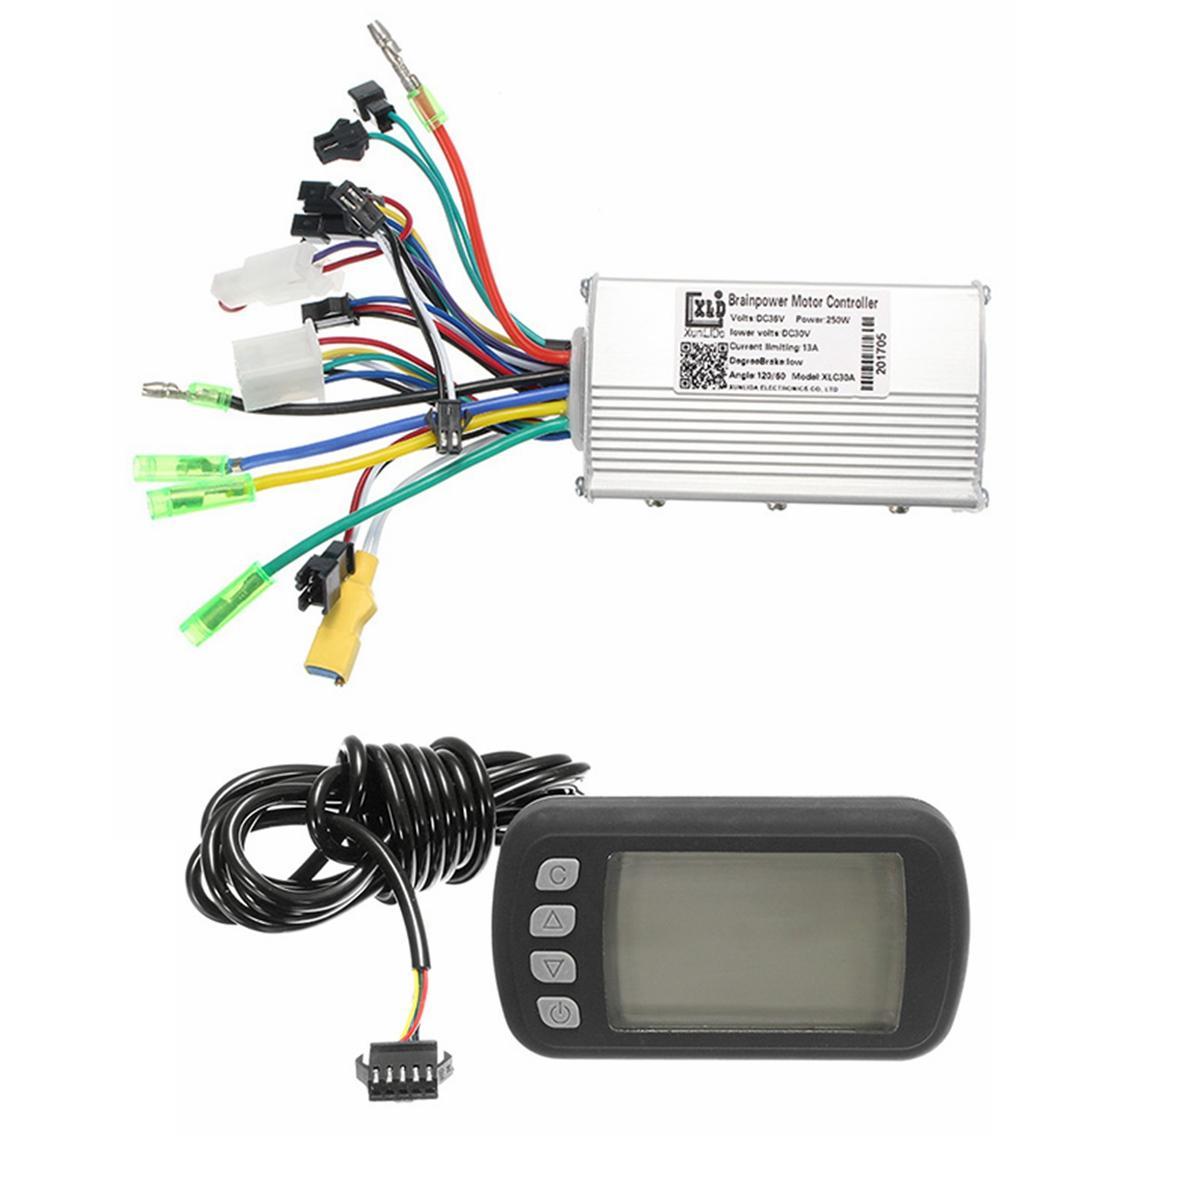 24V36V48V250W350W BLDC Controlador de Velocidad de Motor LCD Pantalla para MTB E-Bicicleta Scooter Modelo A